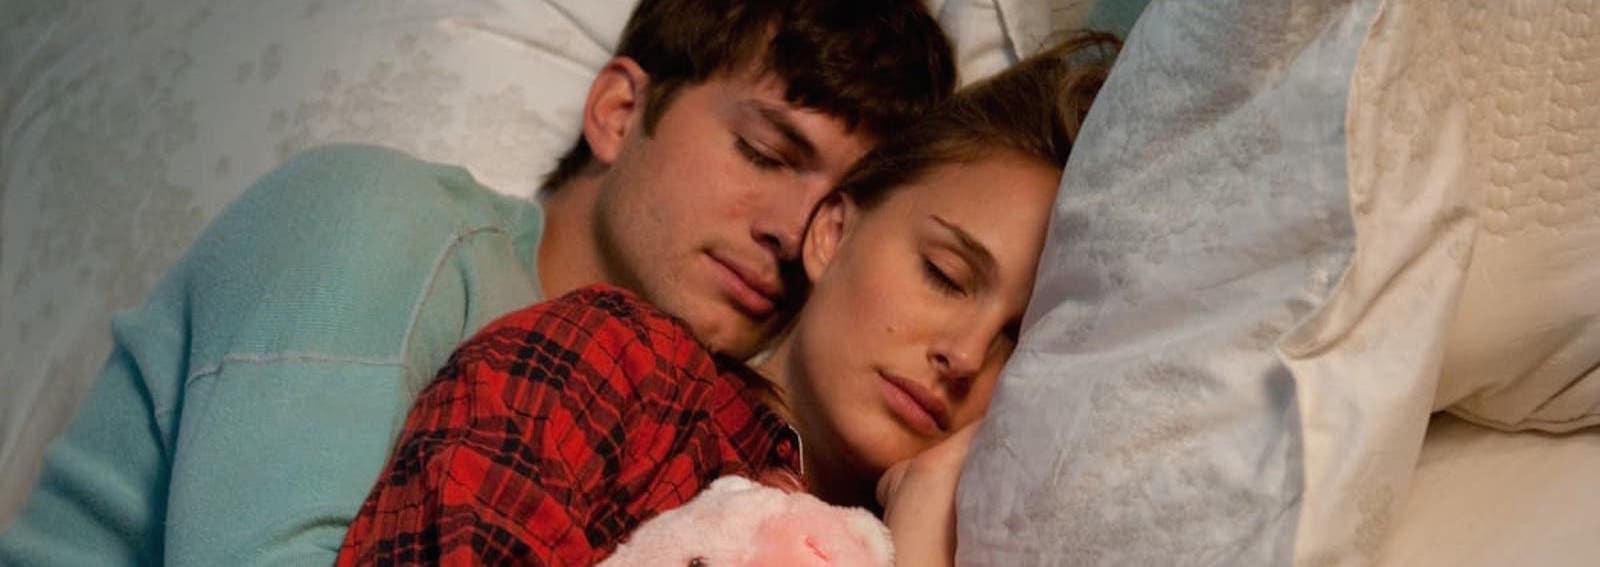 Natalie Portman pigiama